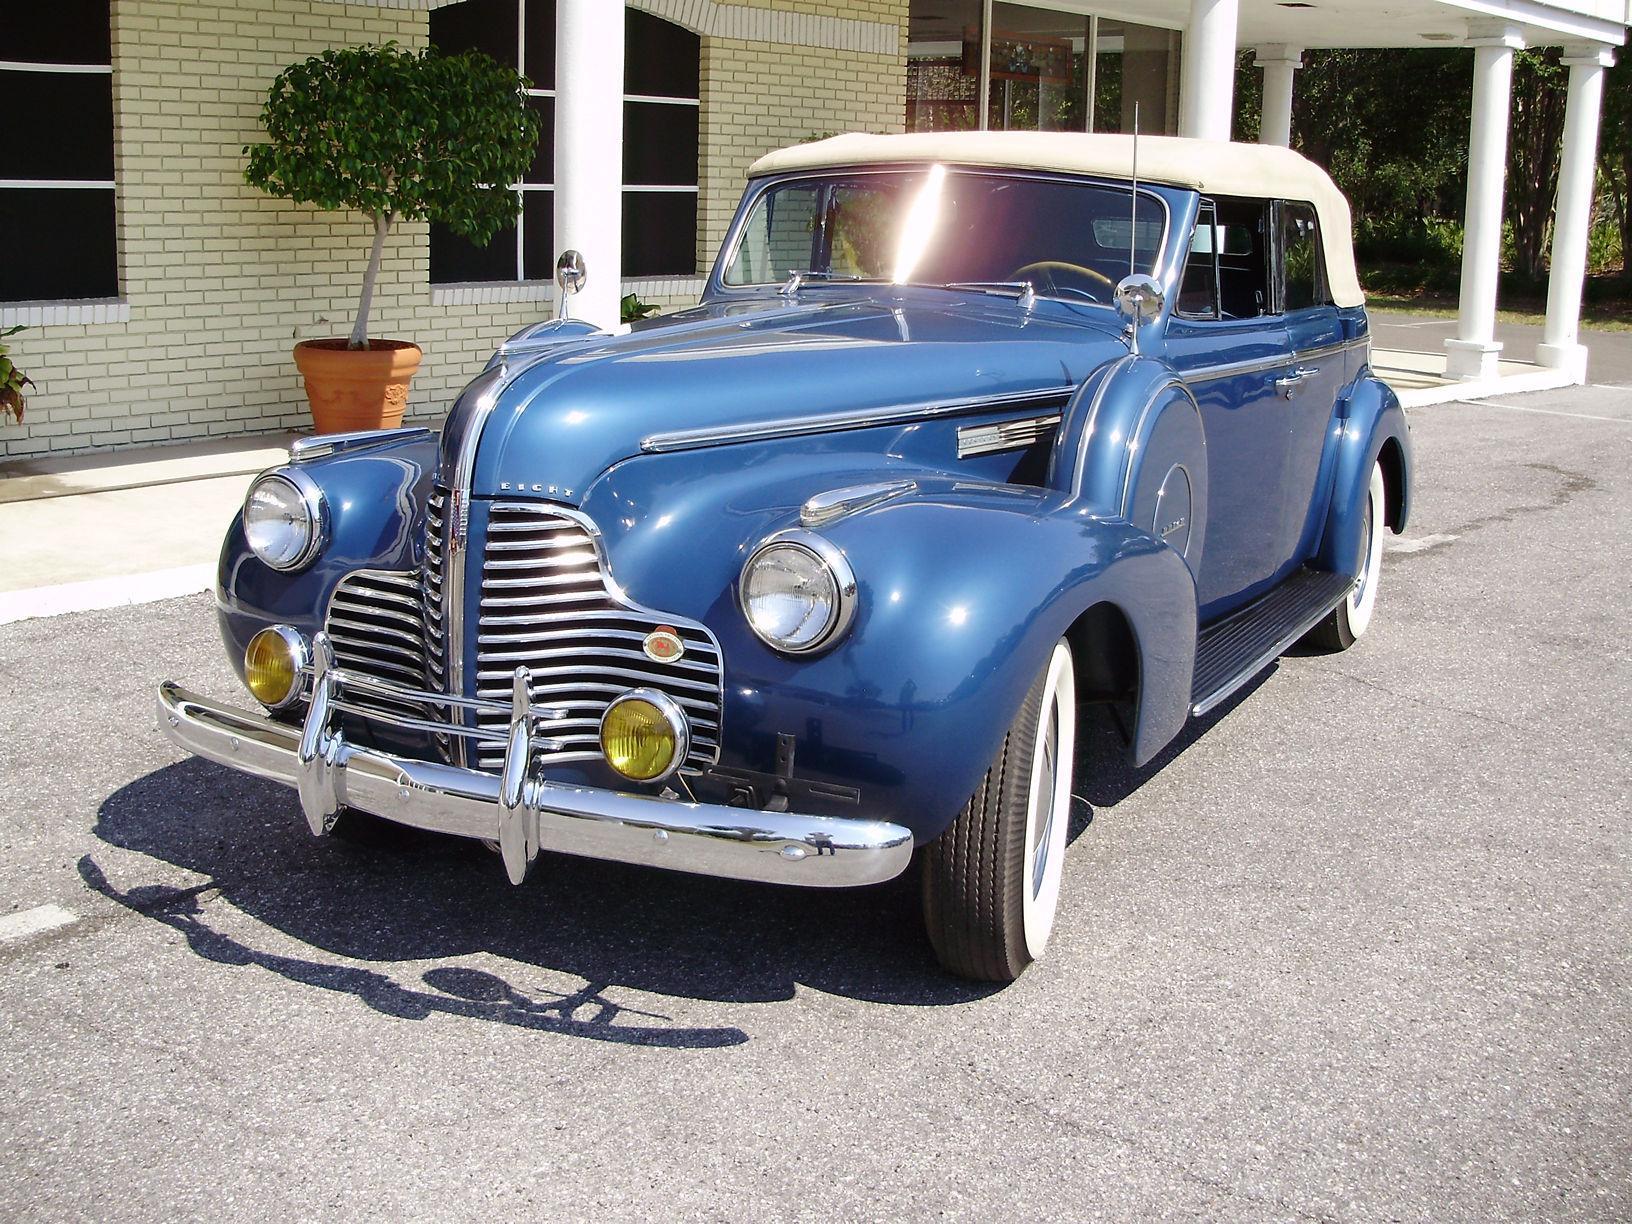 1940 BUICK CENTURY CONVERTIBLE SEDAN - Vintage Motors of Sarasota Inc. #12